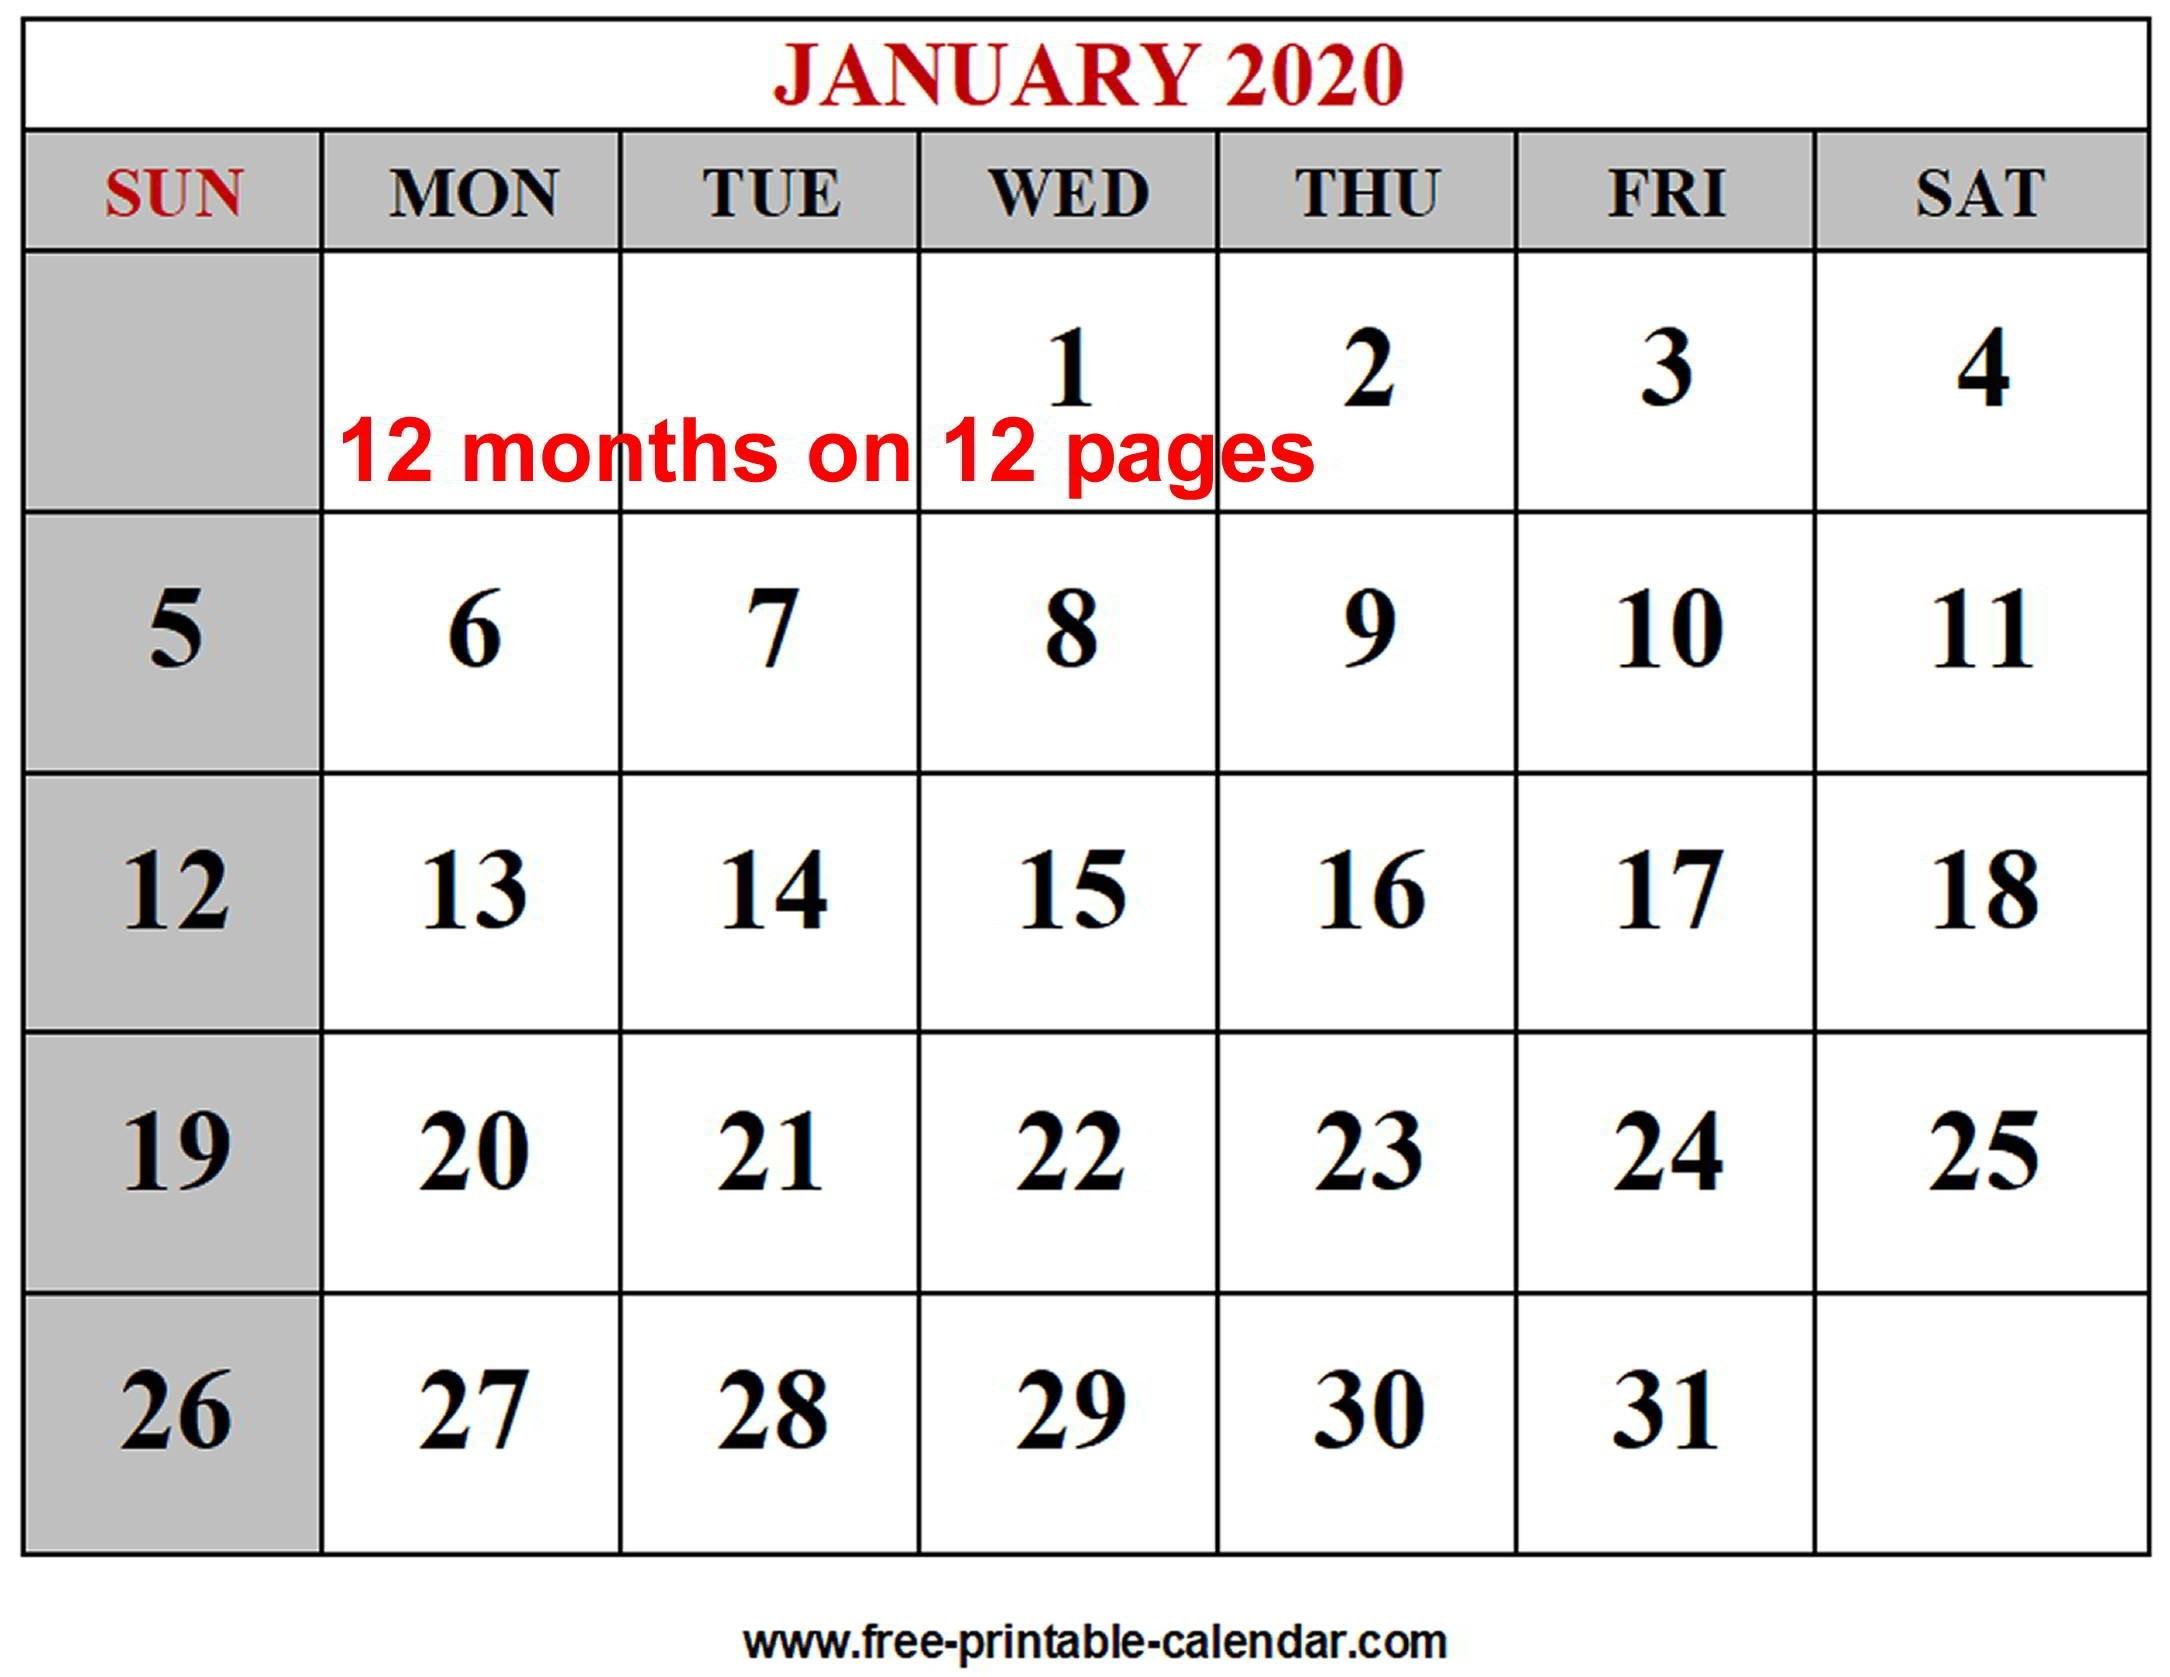 Year 2020 Calendar Templates - Free-Printable-Calendar-2 Monthly Printable Calender